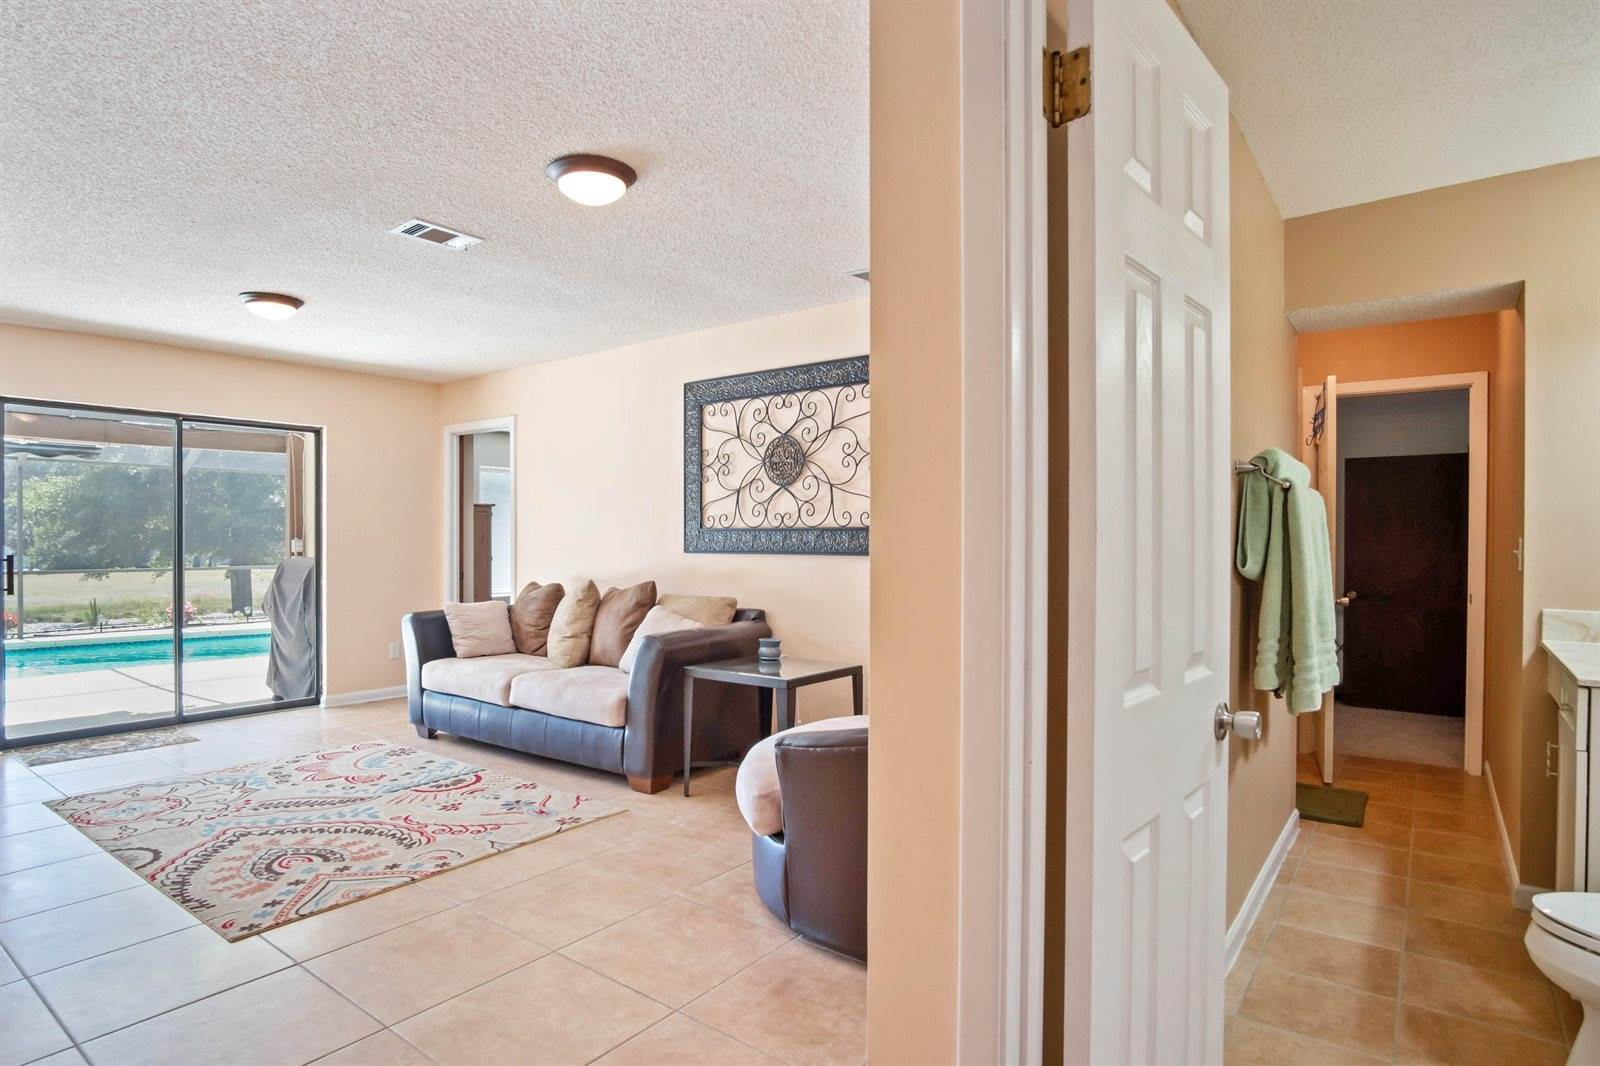 309 Antiqua Way, Niceville, FL 32578